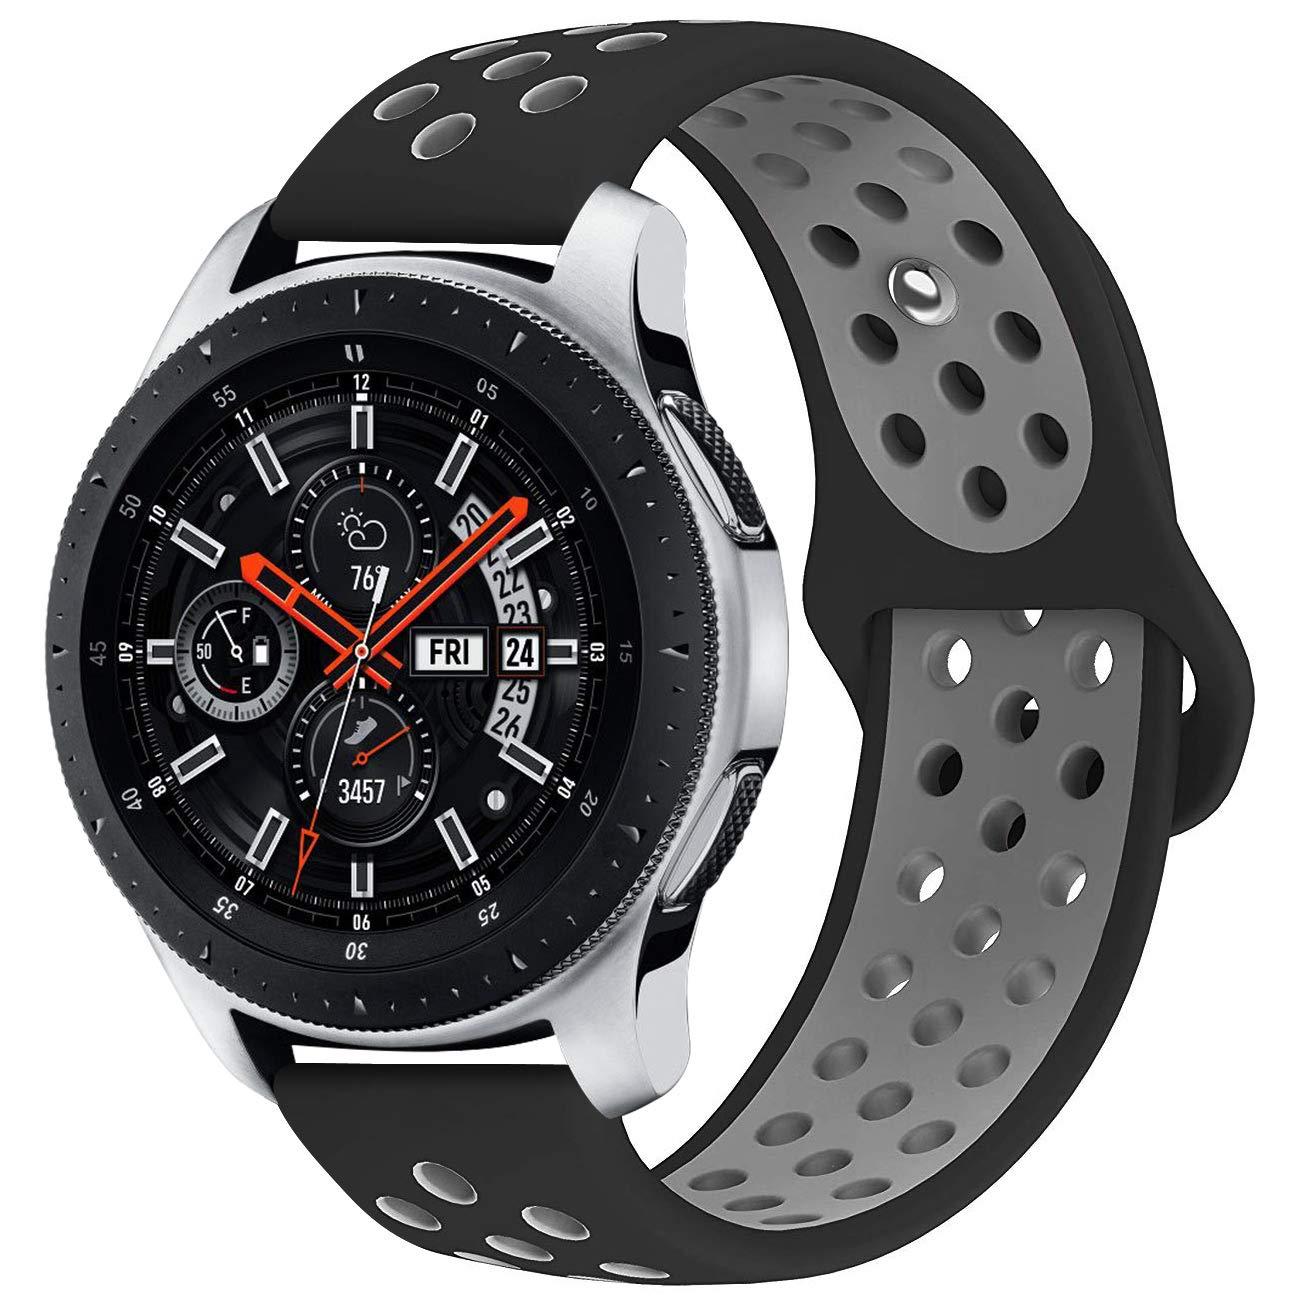 Malla Para Reloj Ticwatch Pro, Amazfit Stratos, Gear S3